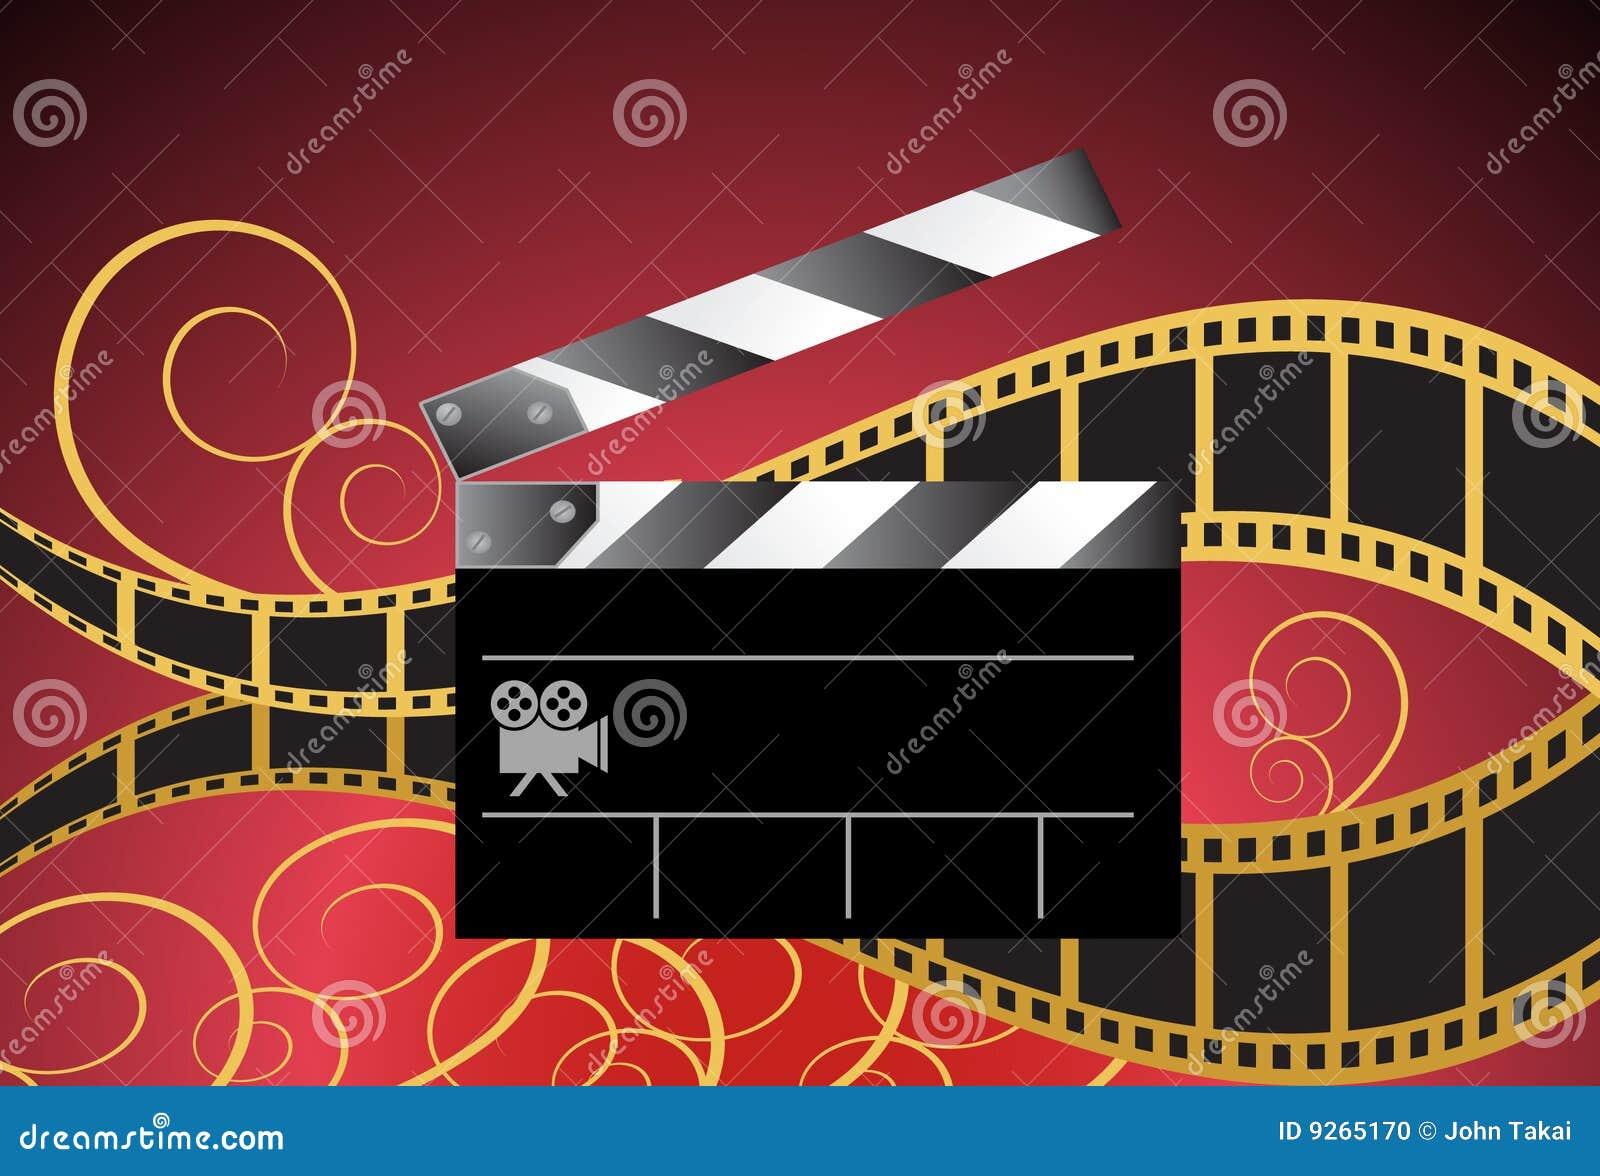 Movie theme wallpaperr